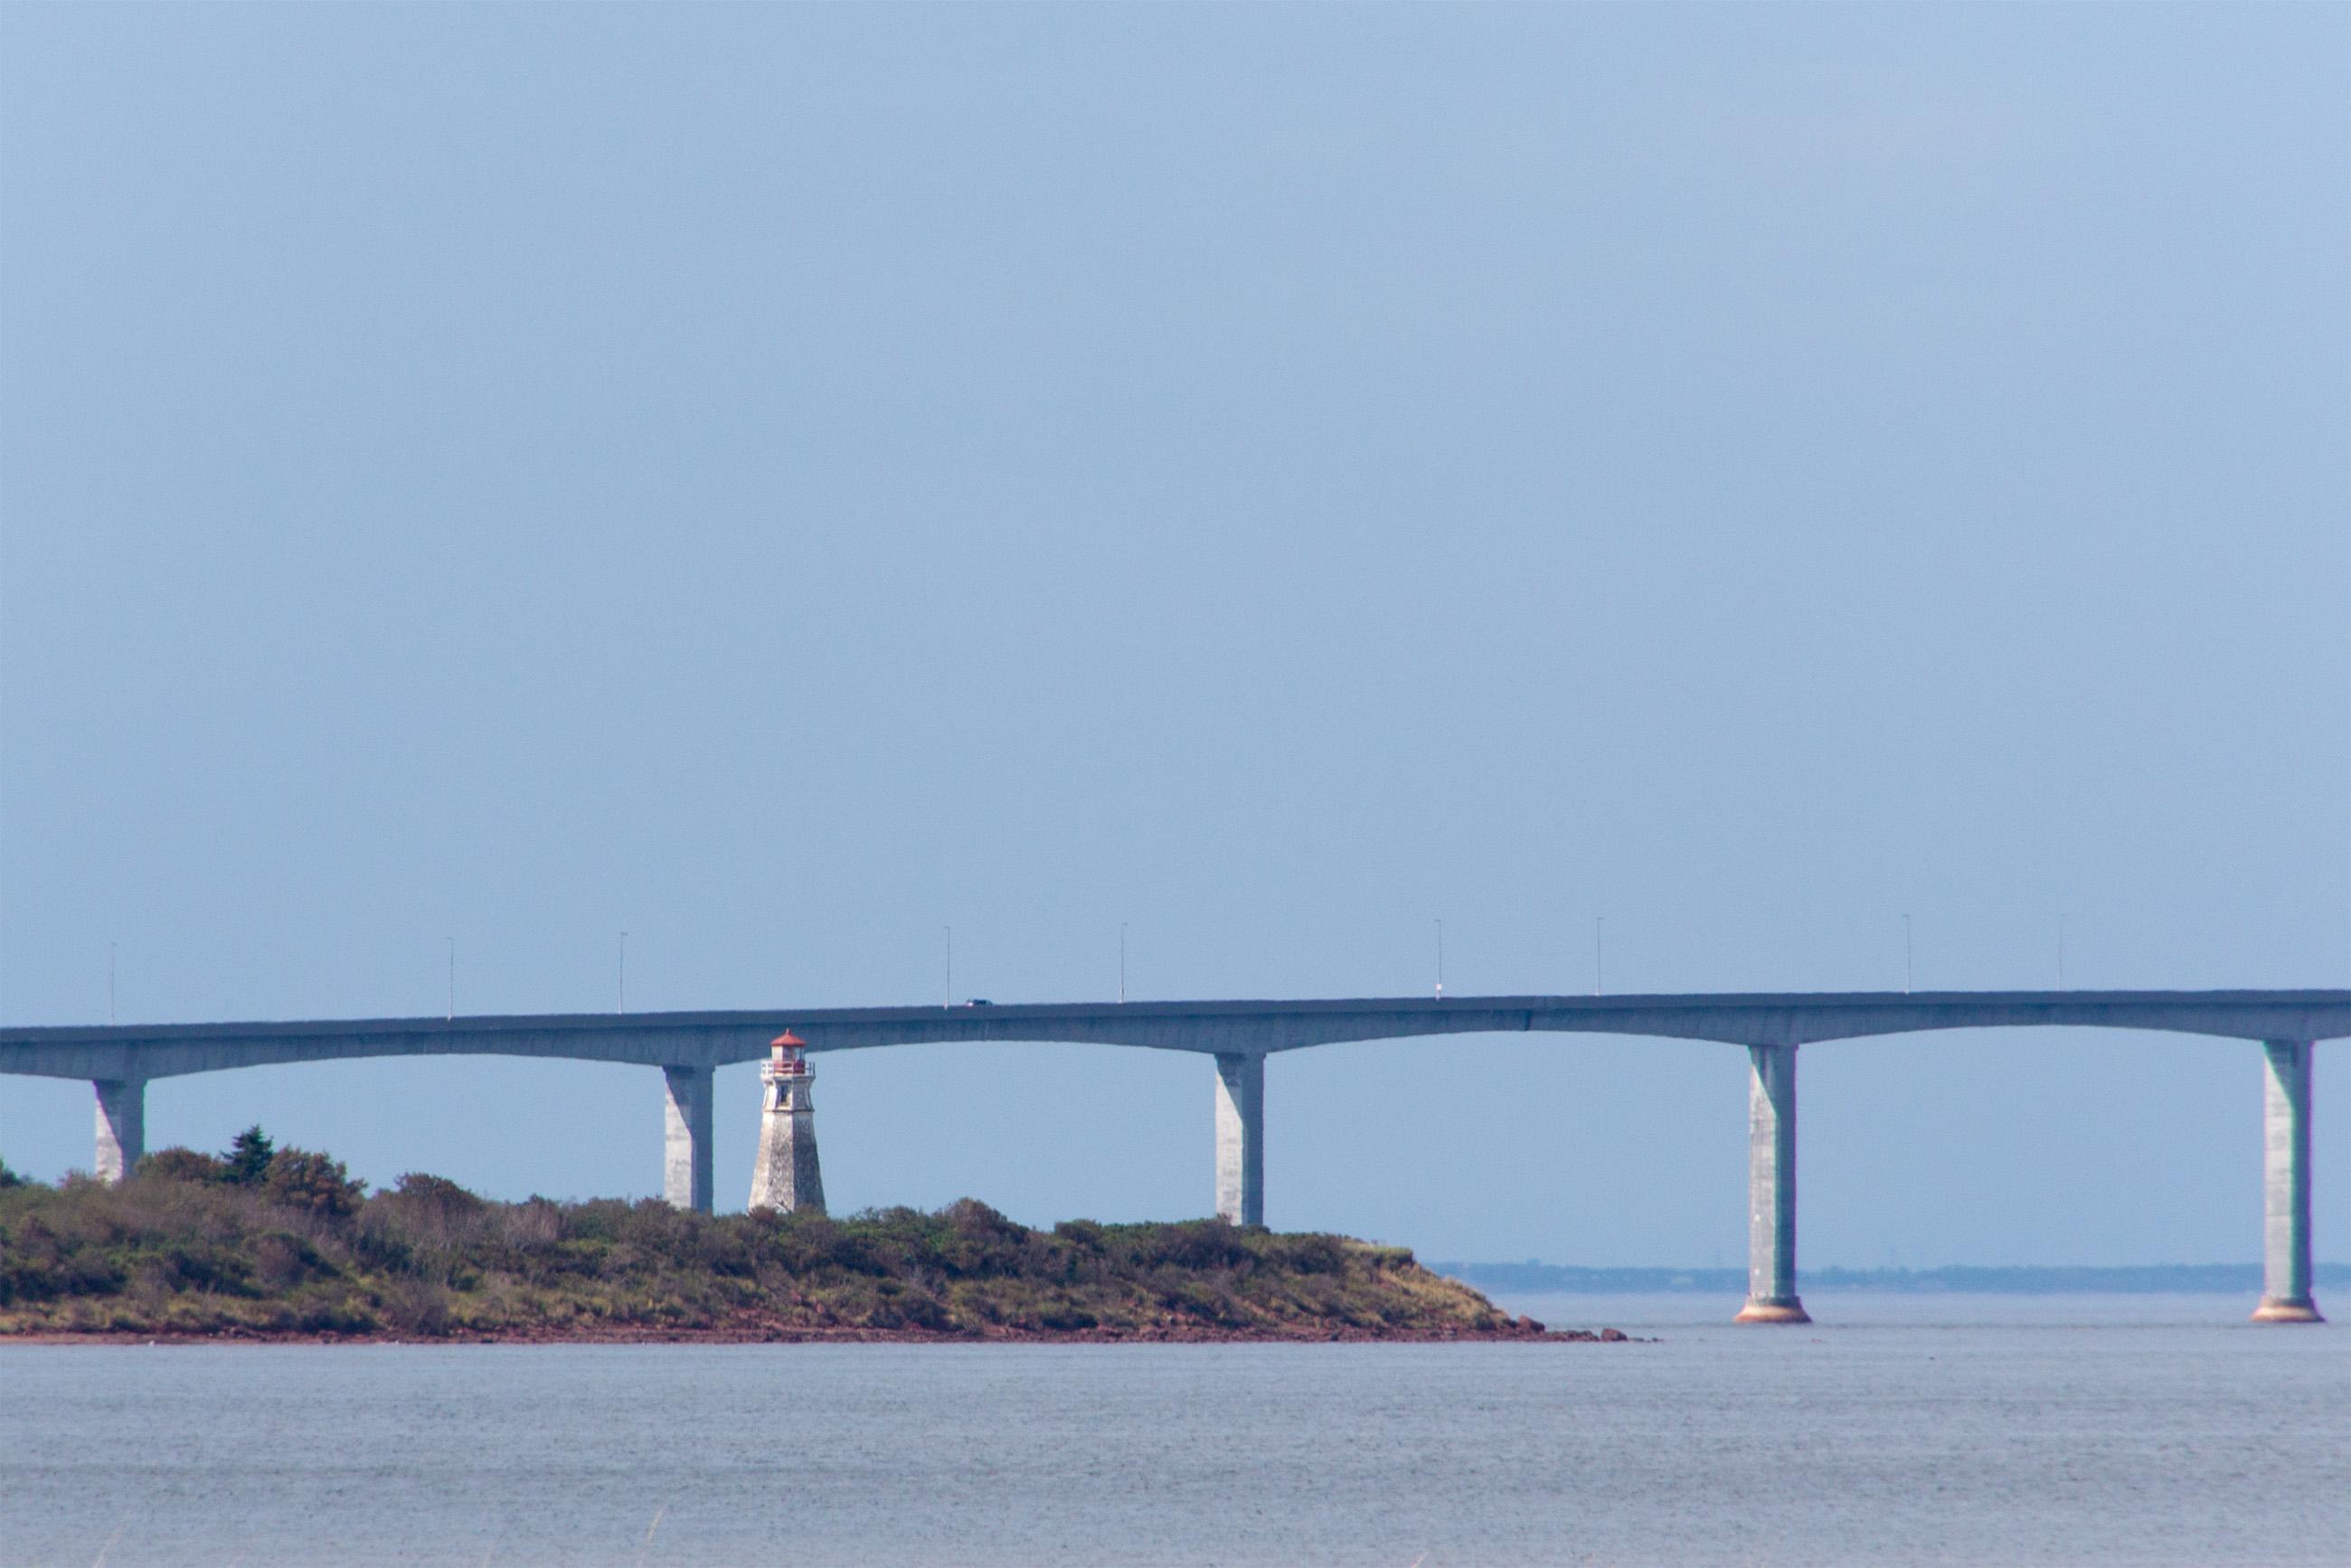 Bridge, PEI, Perspective, Pillars, Prince, HQ Photo